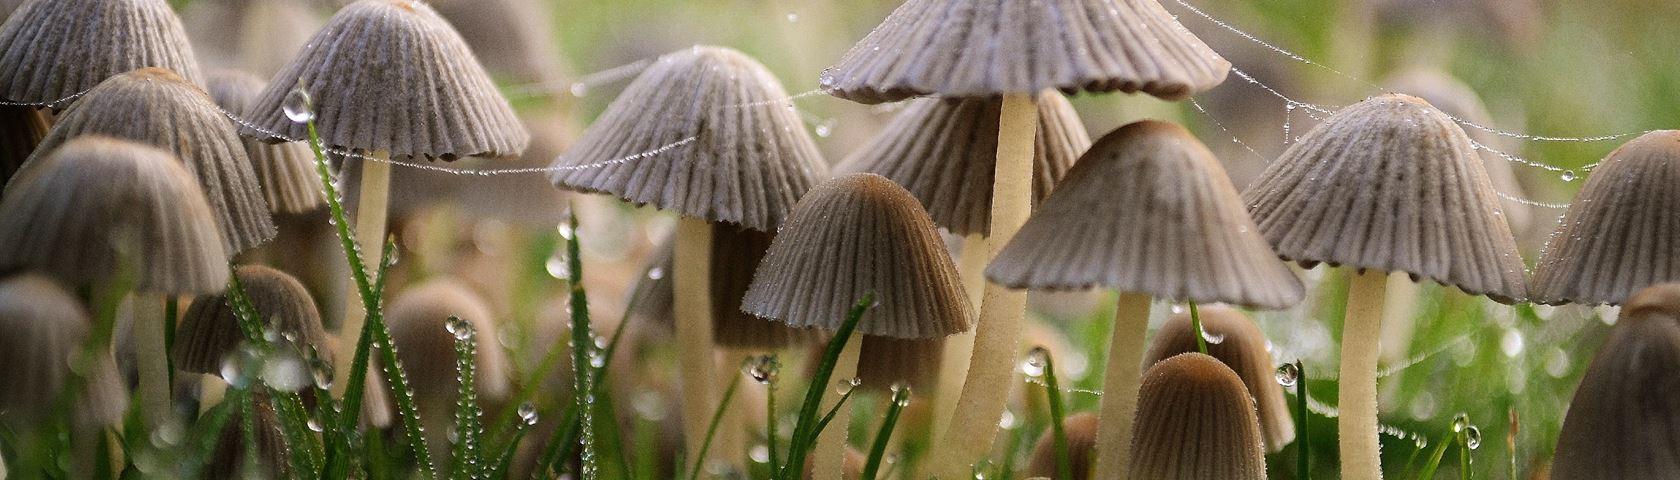 Wild Forest Fungi